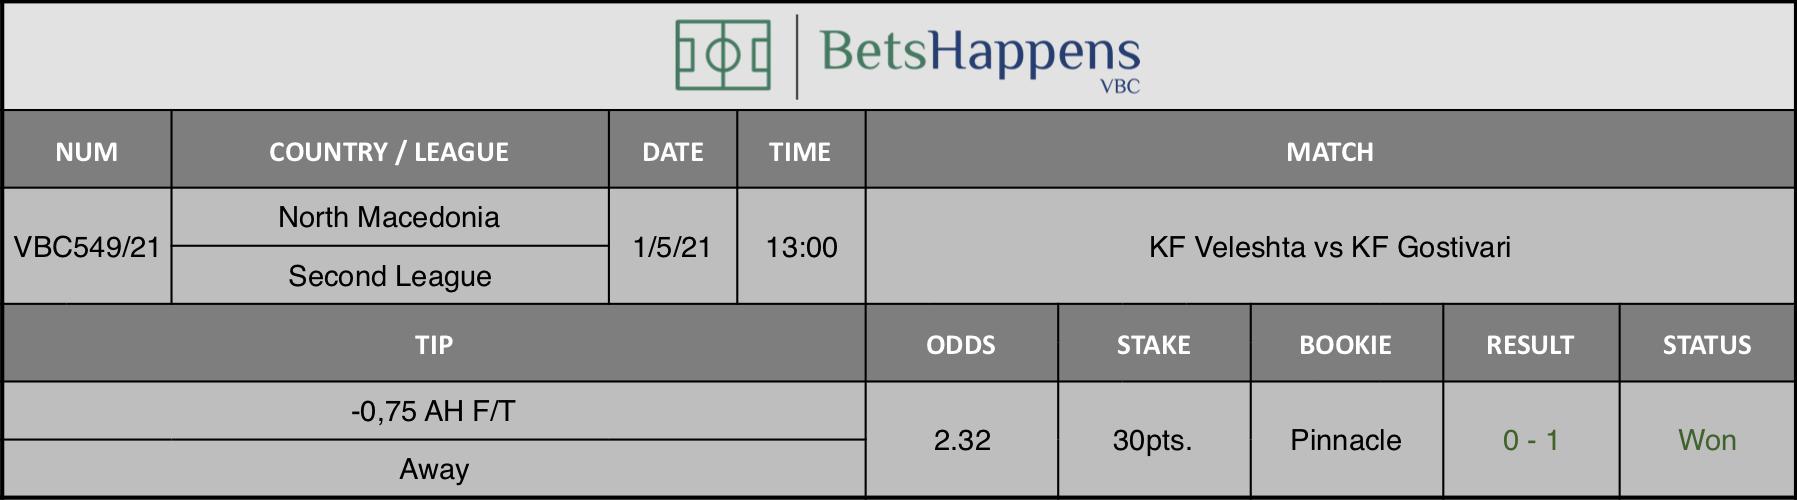 Results of our tip for the KF Veleshta vs KF Gostivari  match where -0,75 AH F/T Away is recommended.